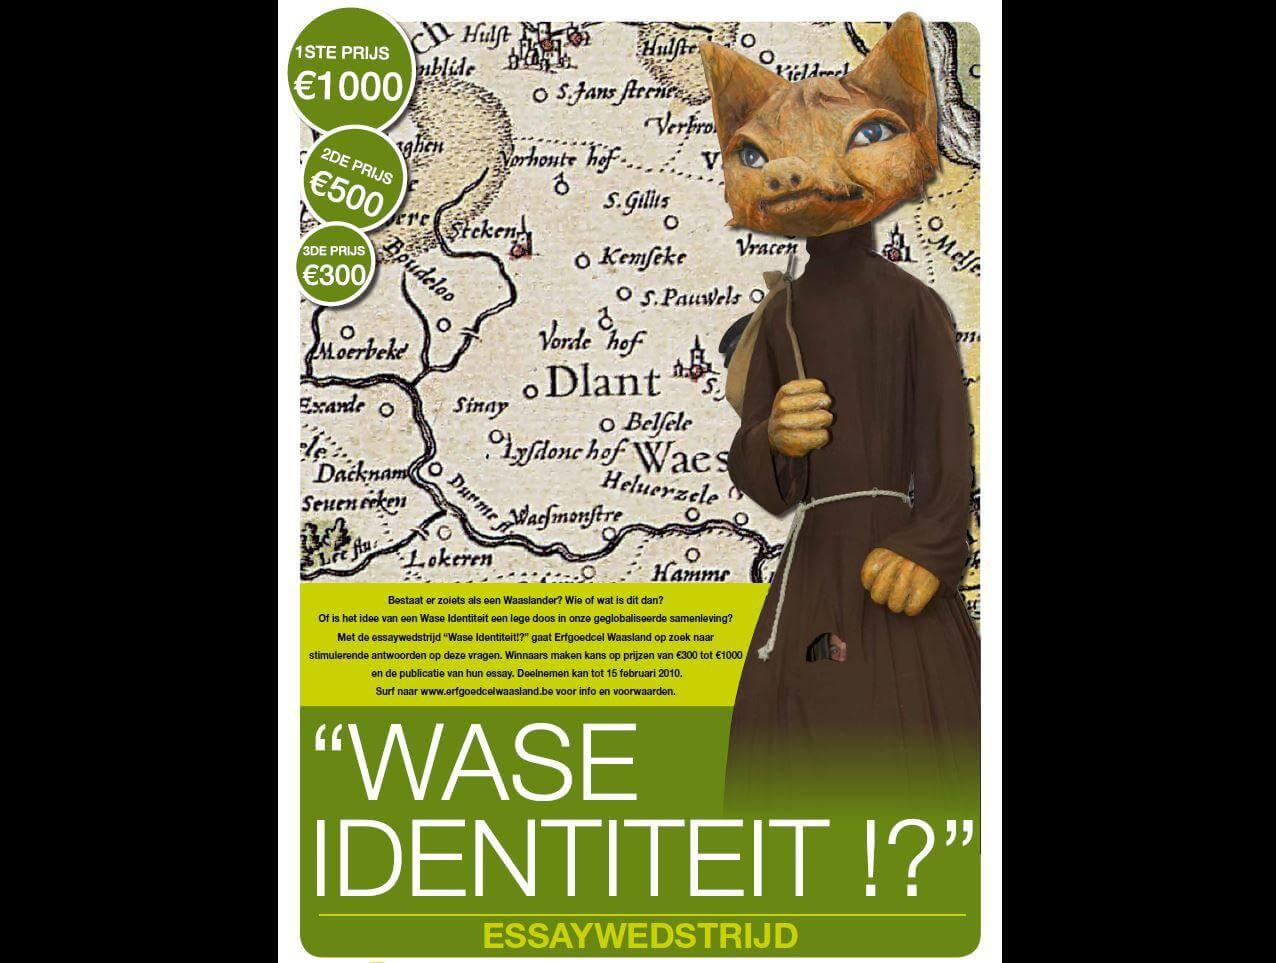 Winnende essays van de wedstrijd 'Wase identiteit'